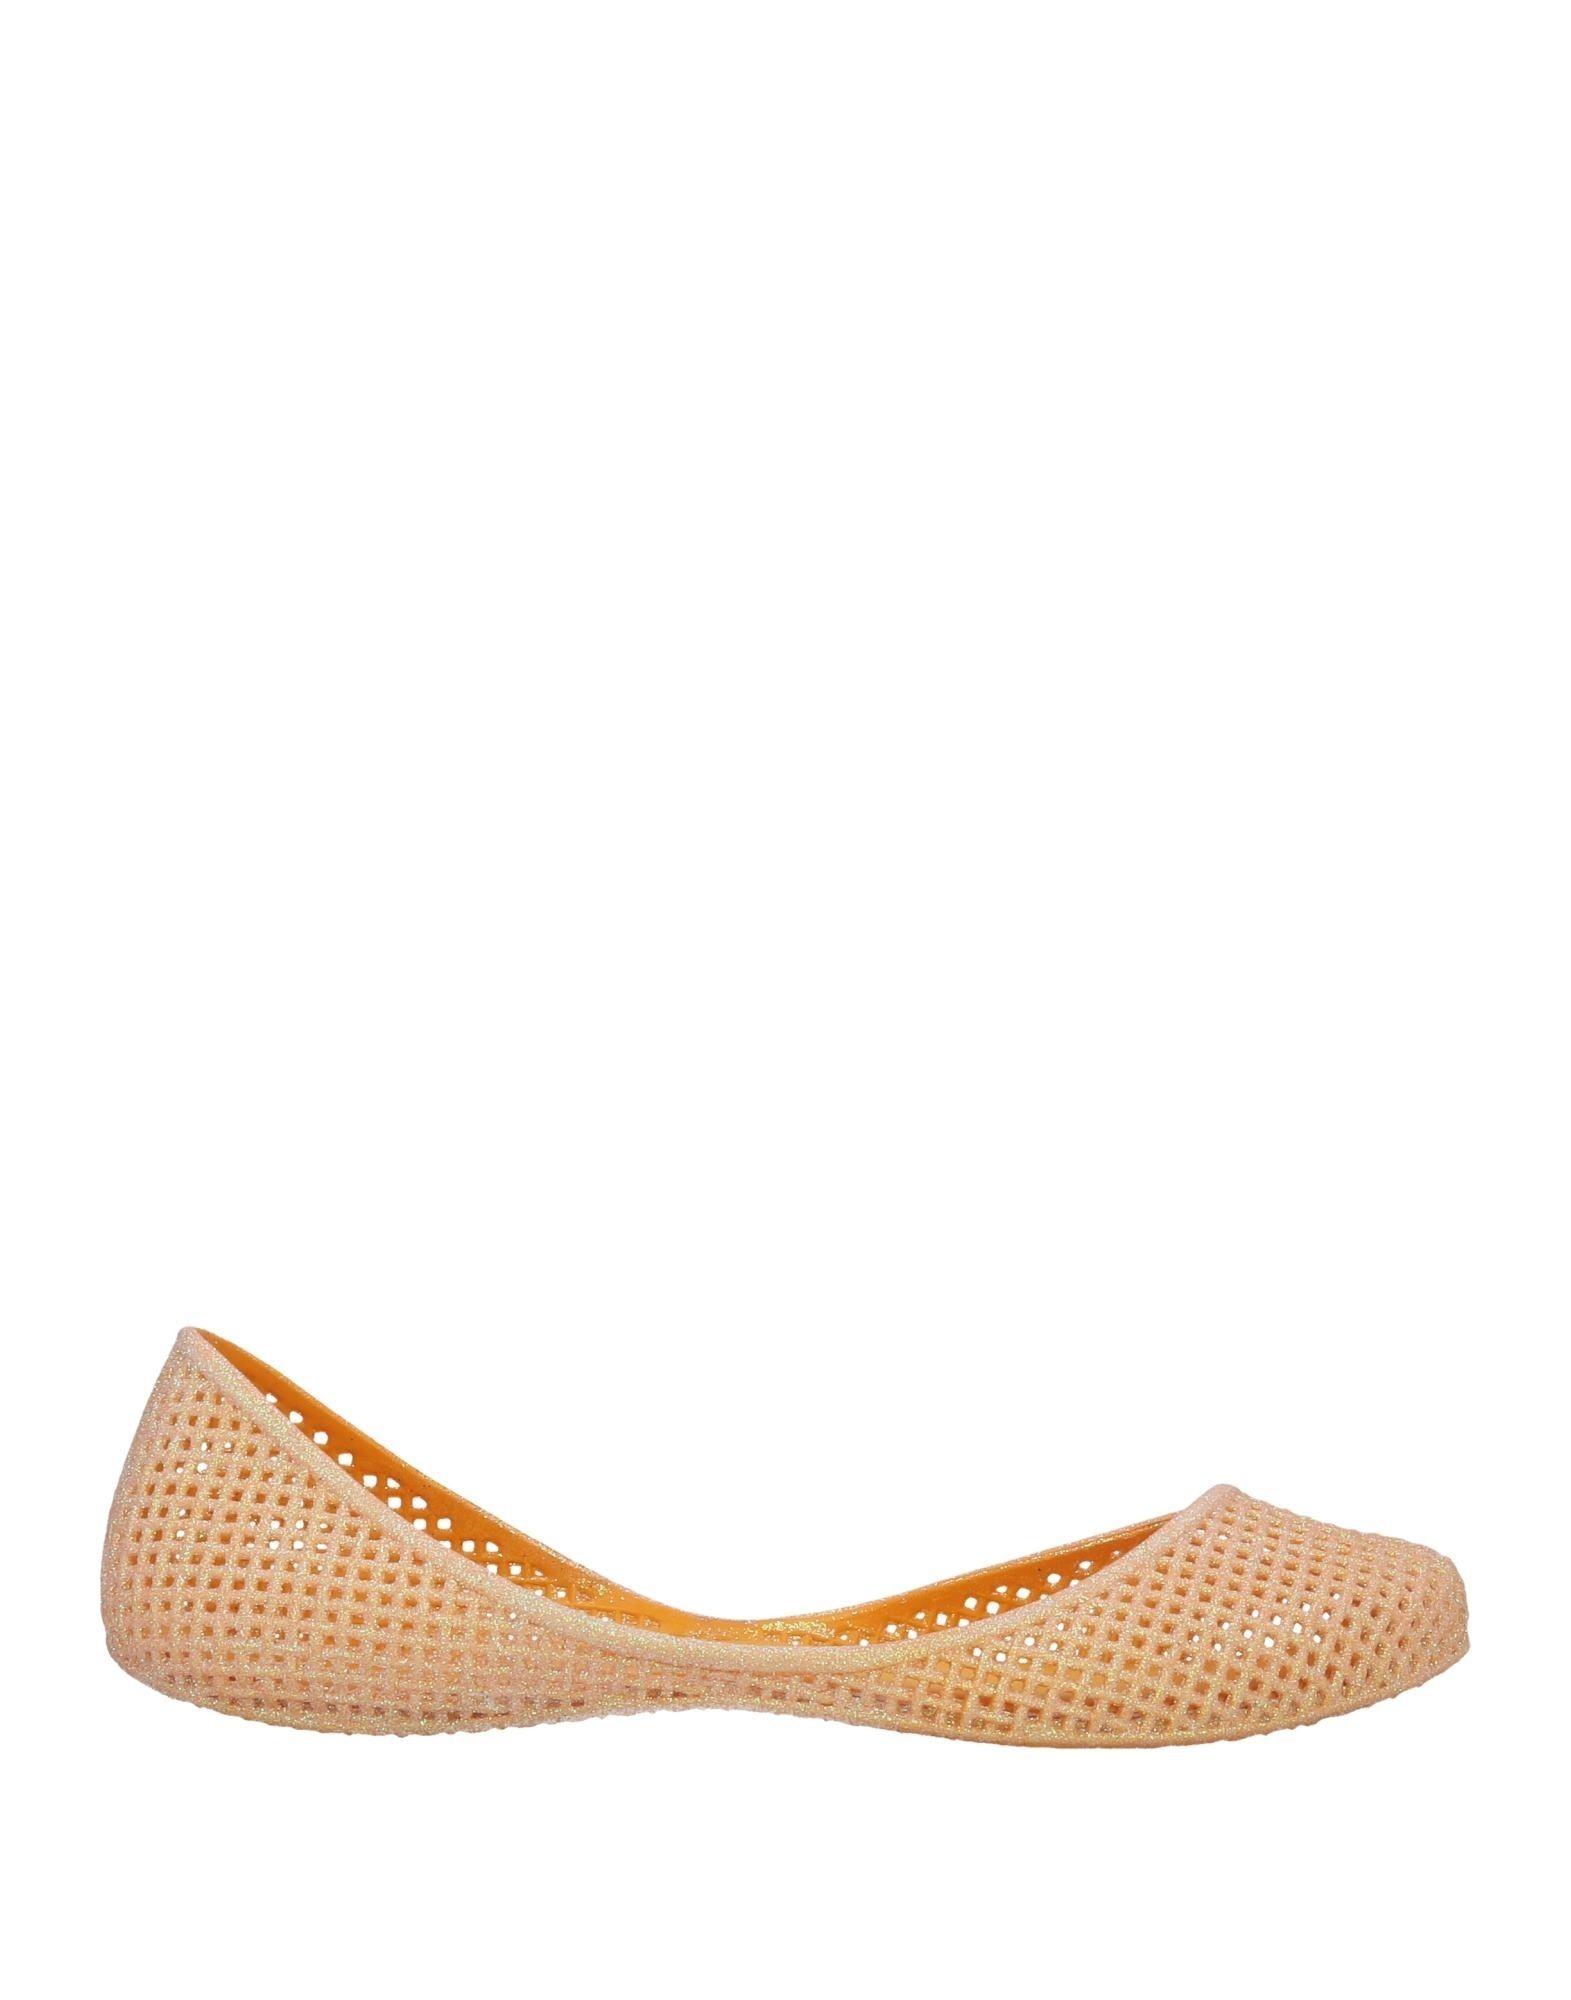 Mel By Melissa Ballerinas Damen  11168454QD Gute Qualität beliebte Schuhe